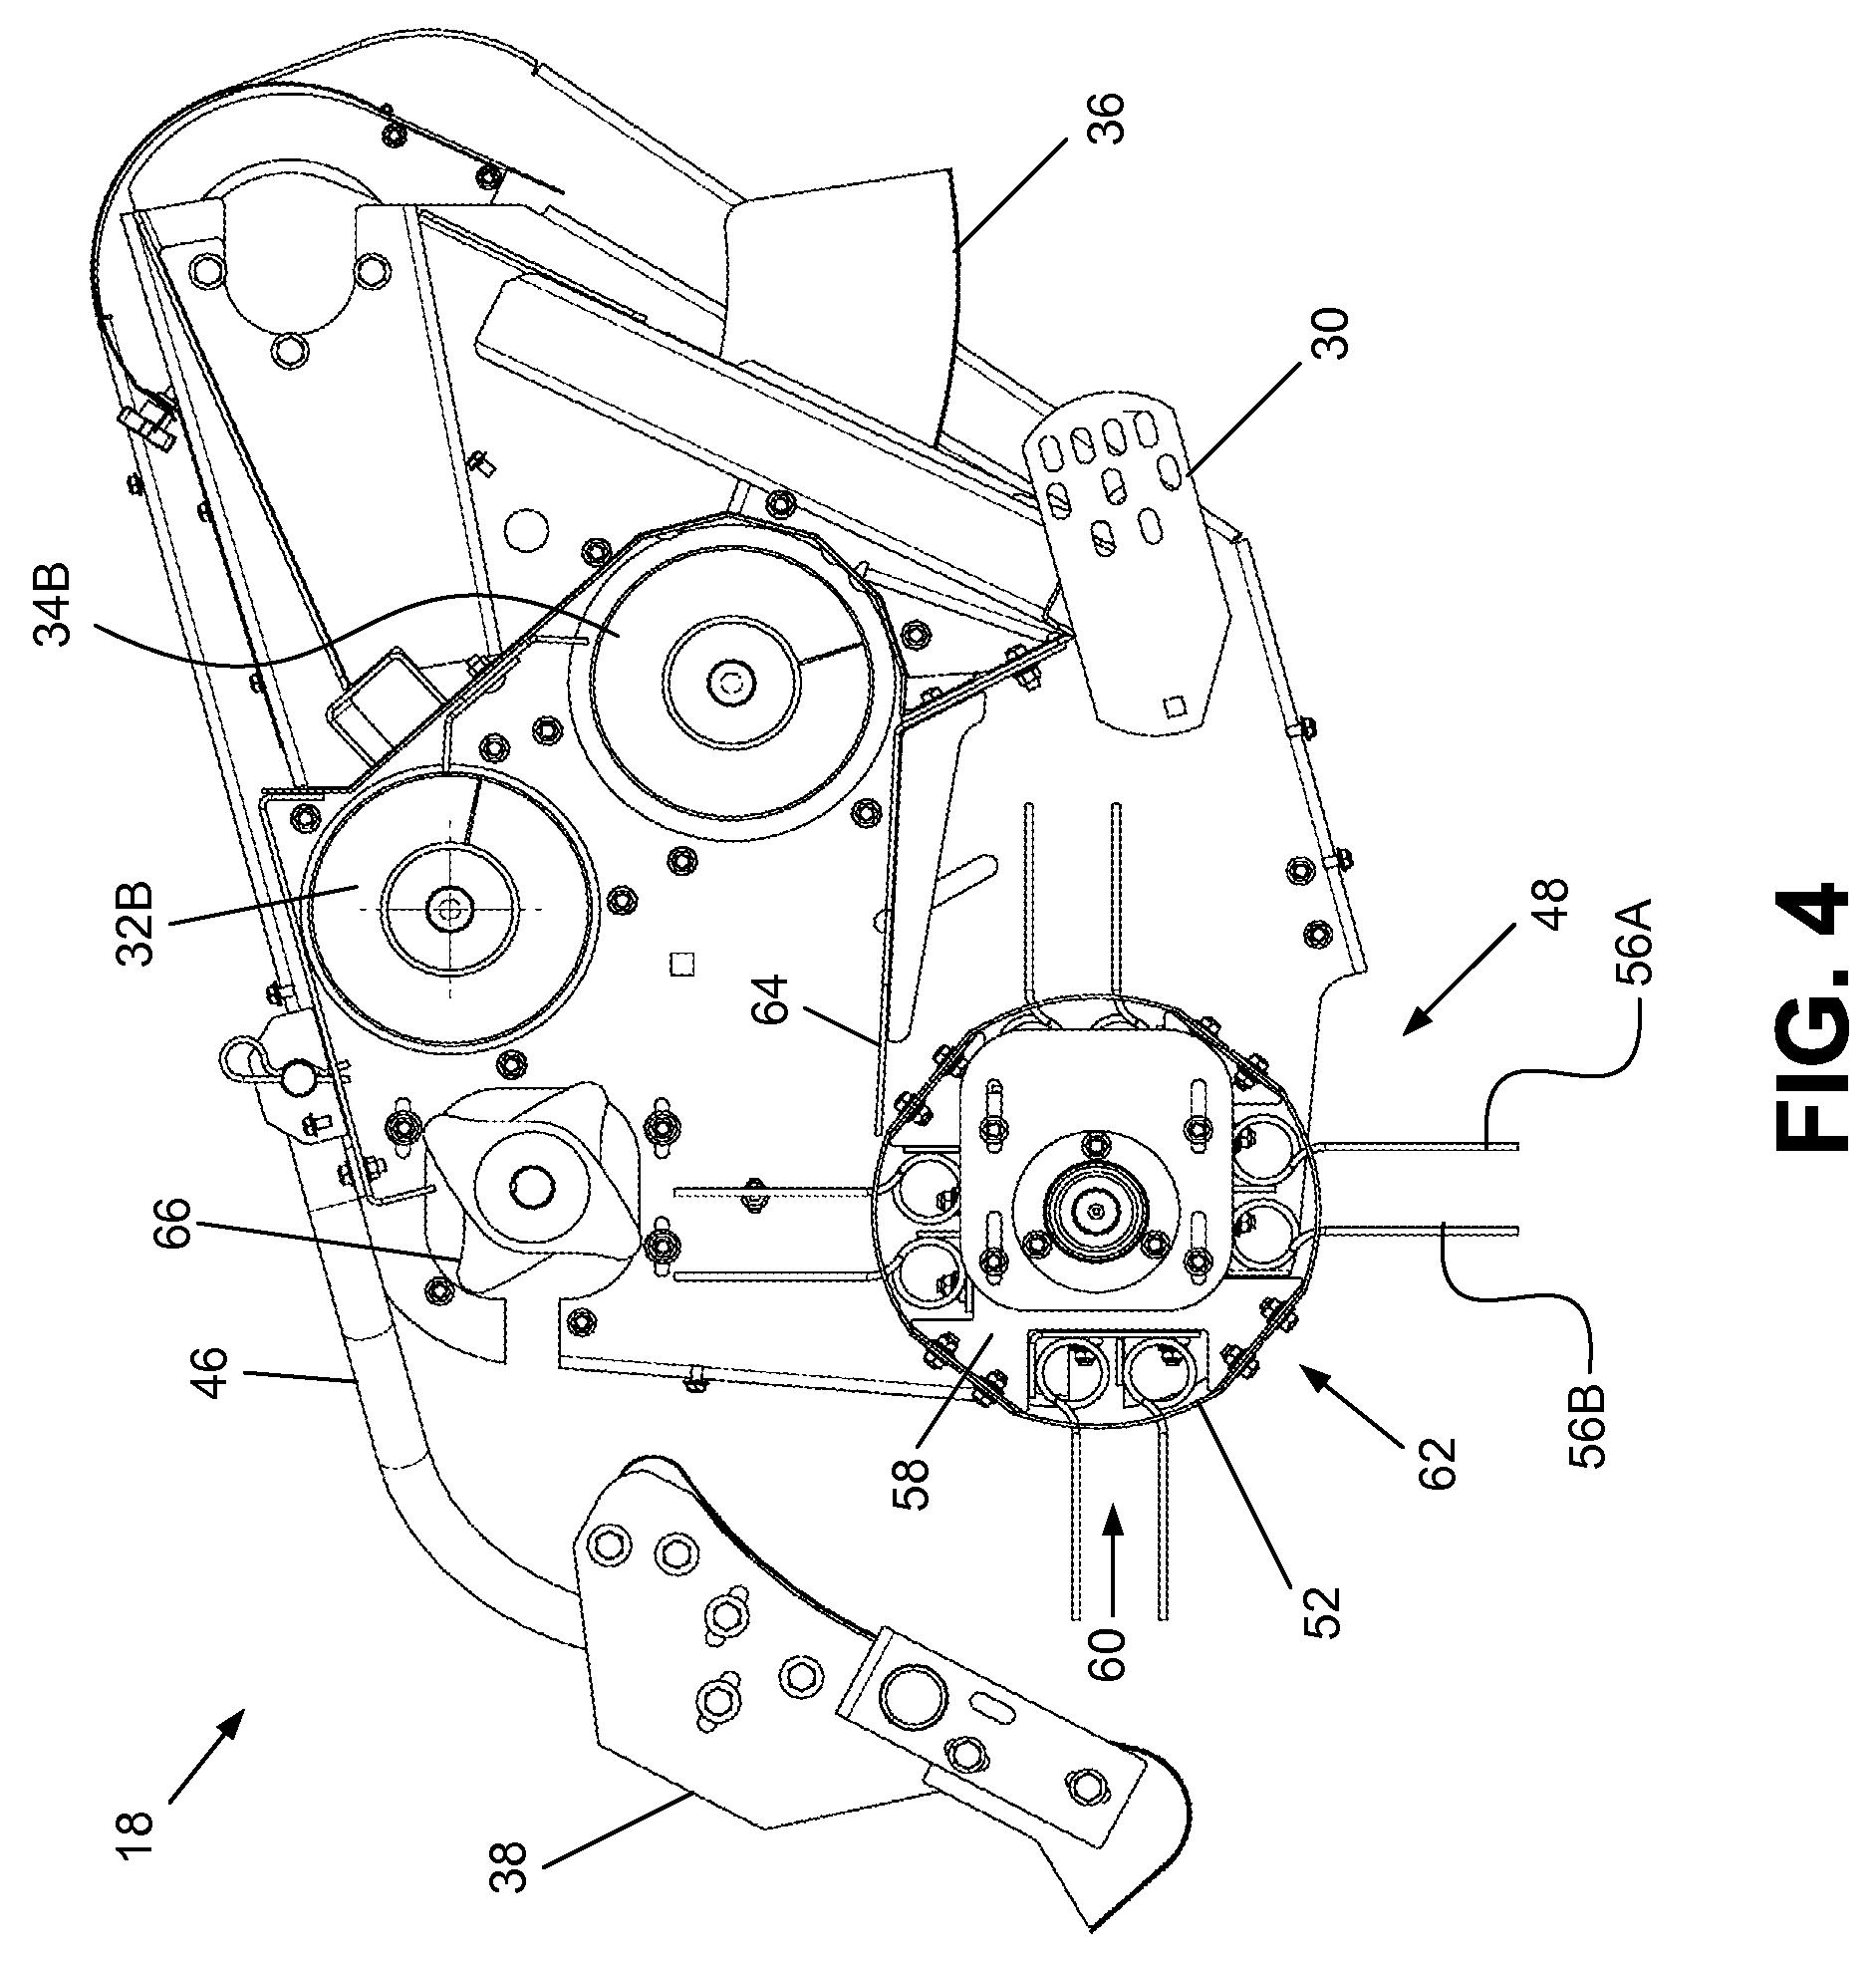 Lt133 Belt Diagram Great Design Of Wiring John Deere 214 Mower Deck Car Interior Tractor Engine And Drive